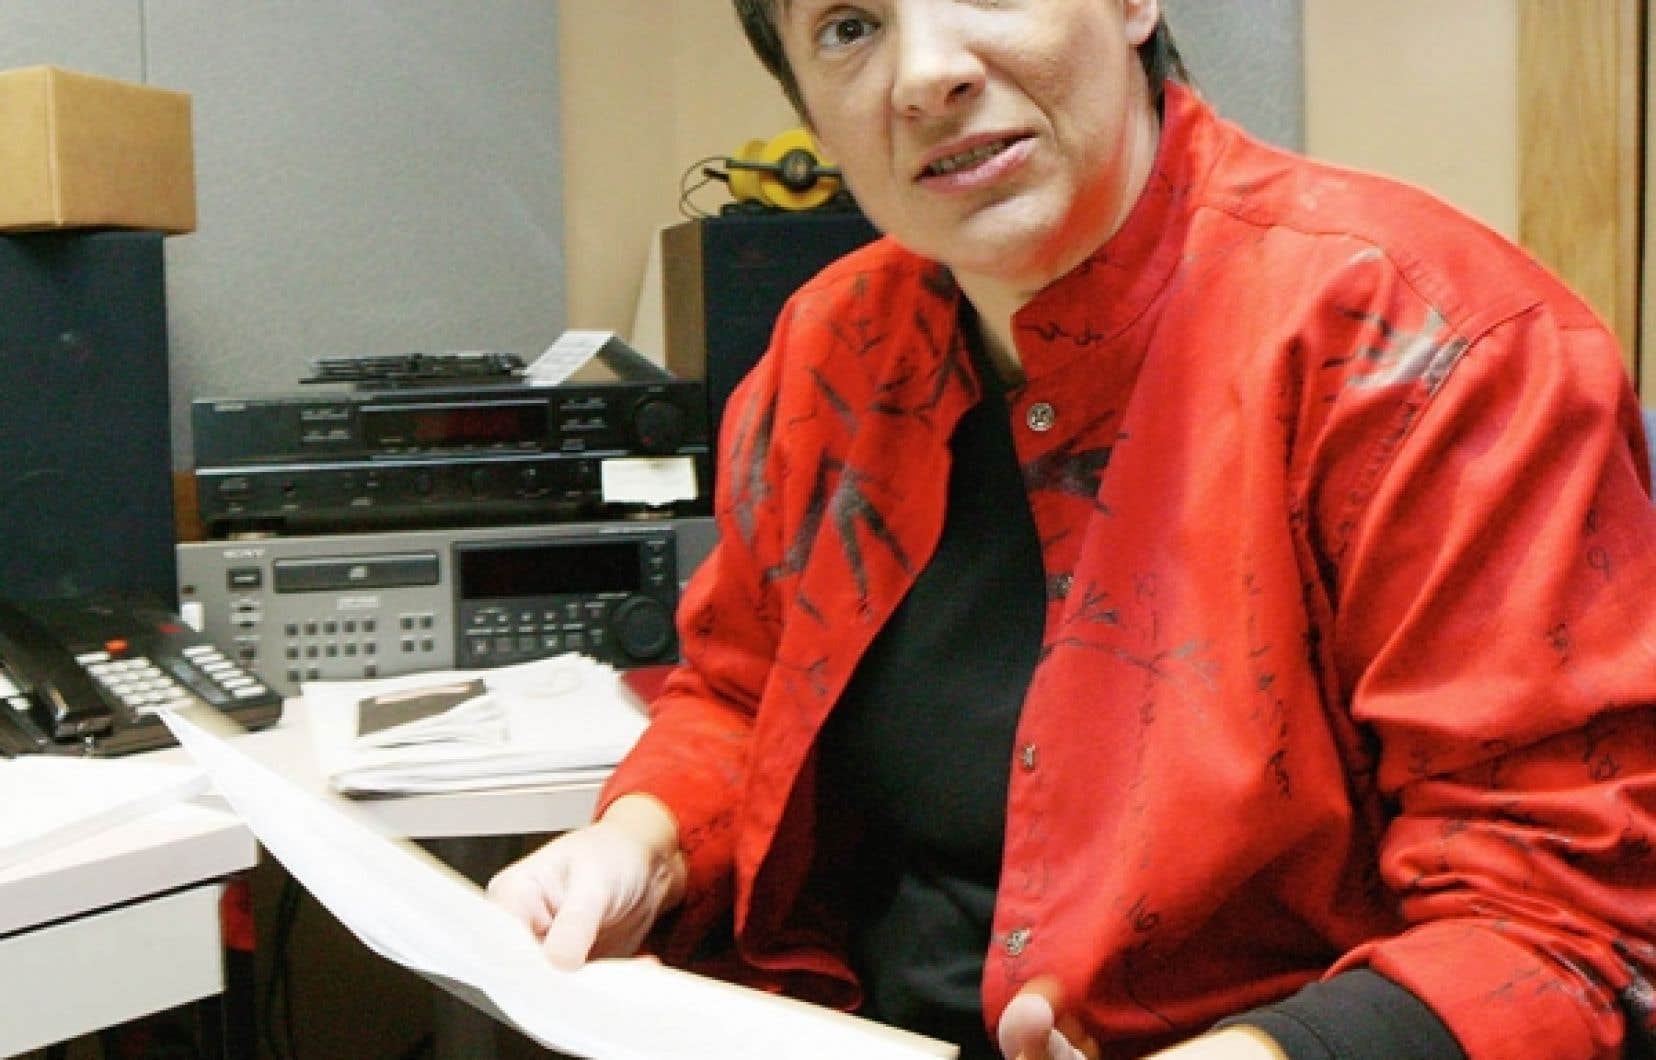 Dominique Payette